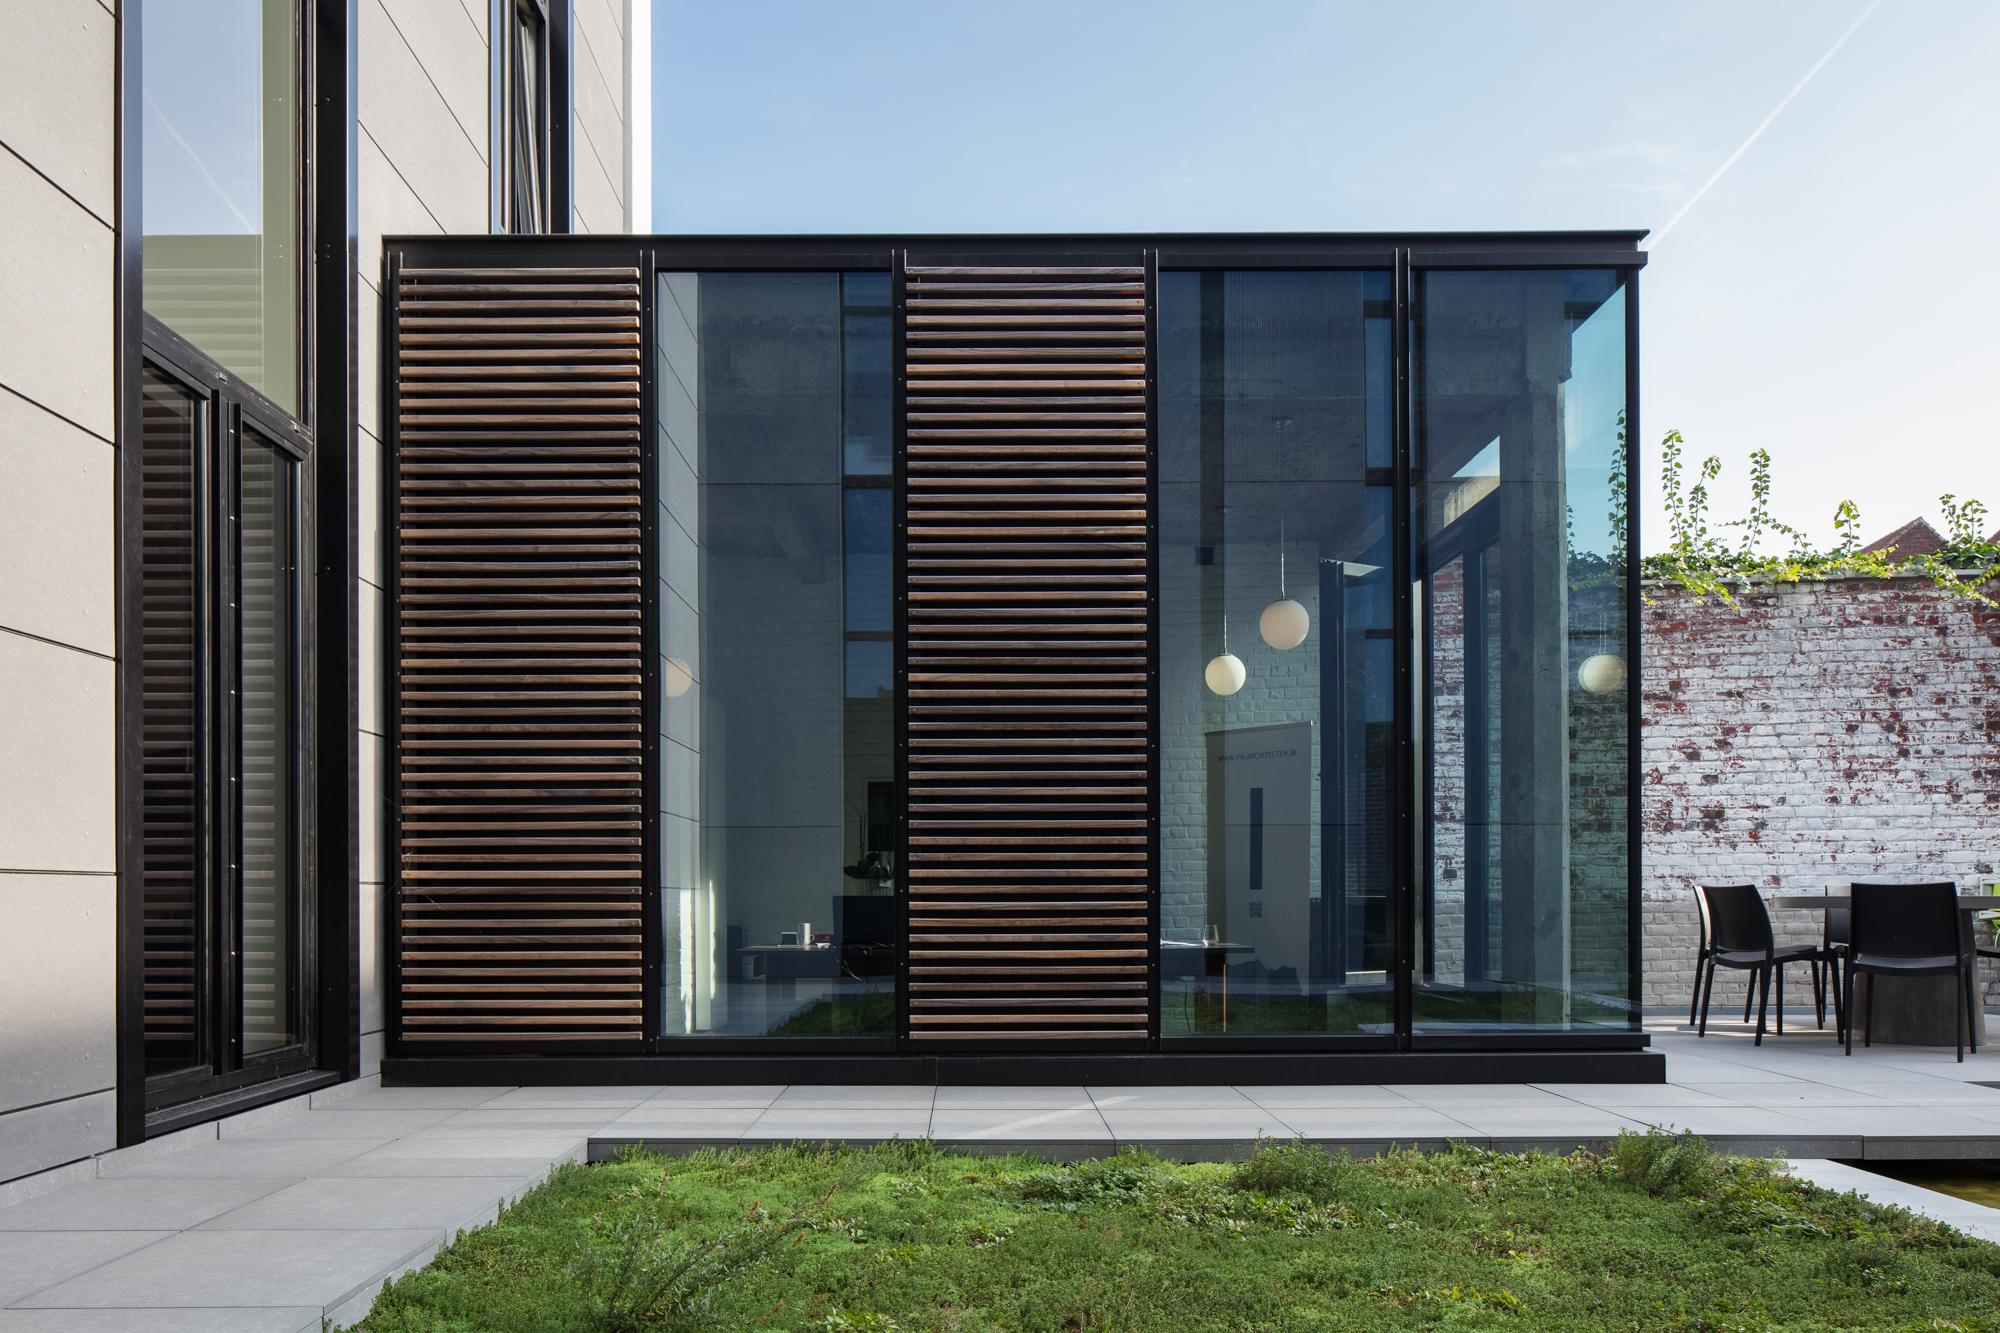 Projecten Architectuur